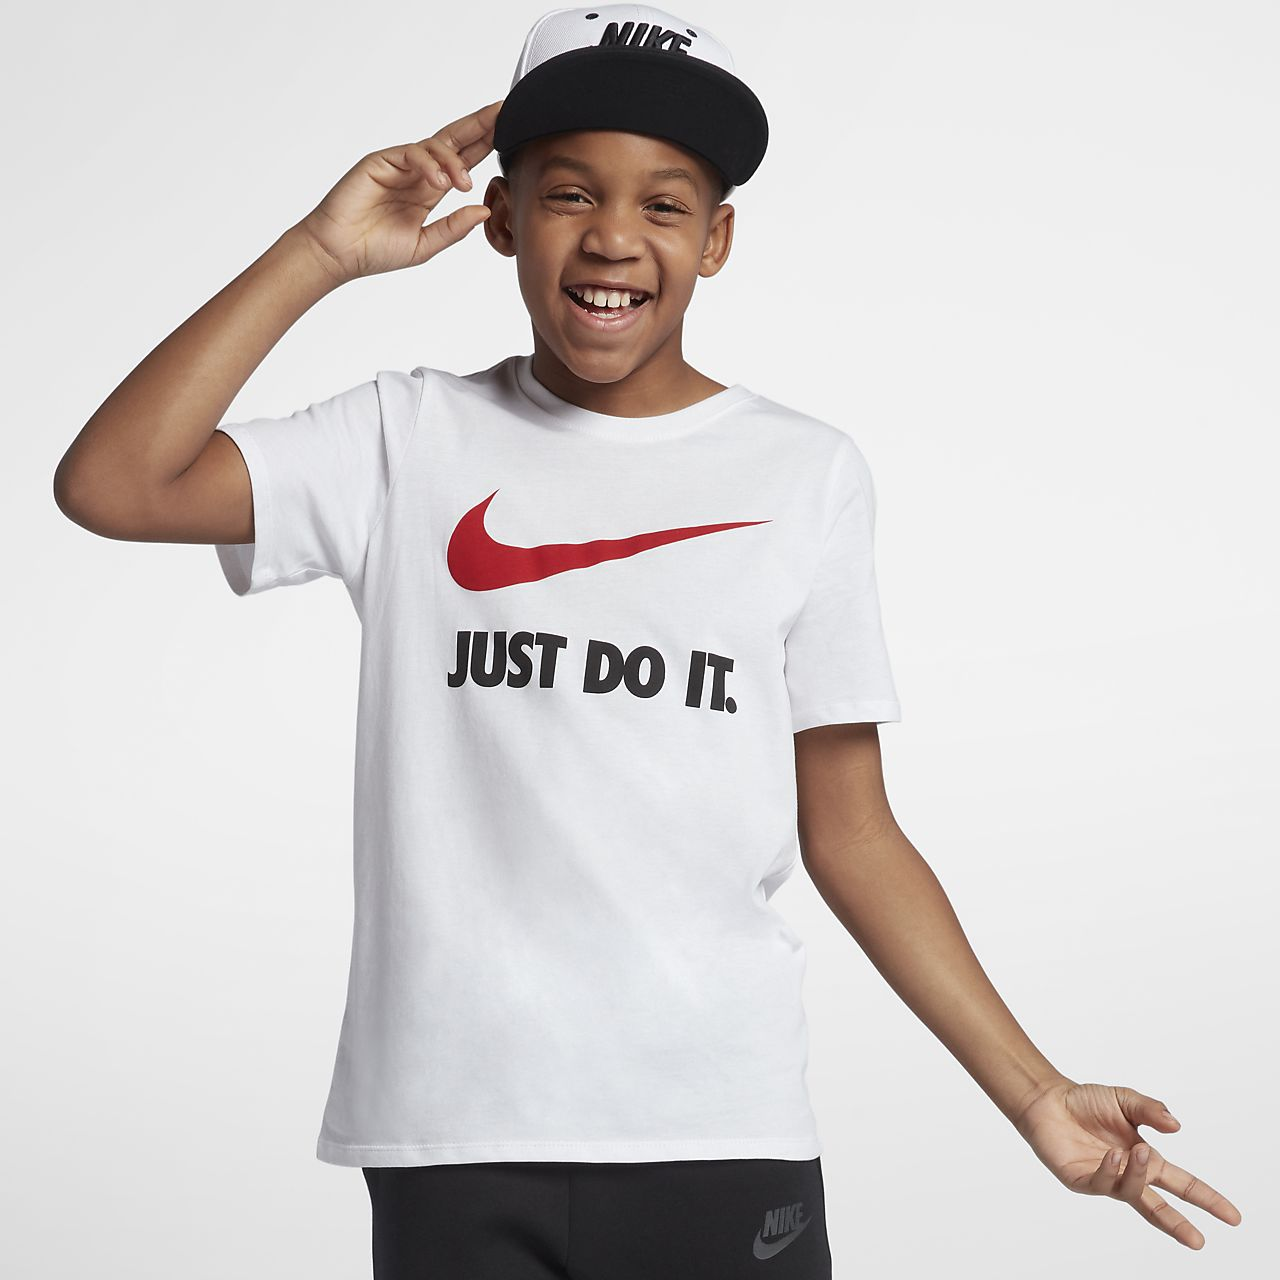 5bad41b0daf92 Camiseta para niños talla grande Nike Just Do It Swoosh. Nike.com MX